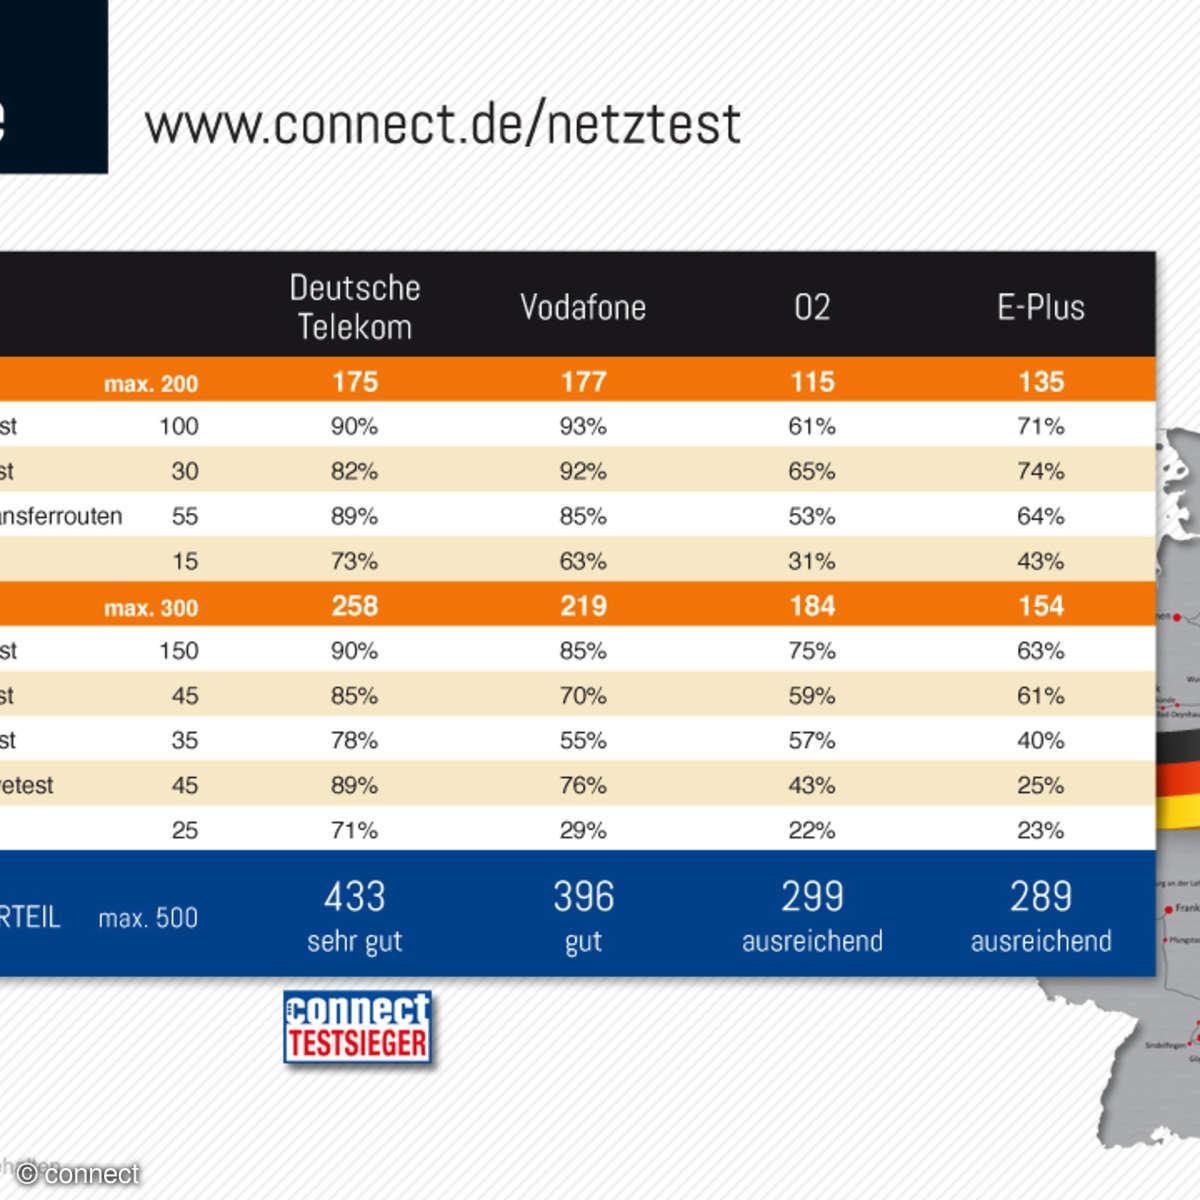 connect Netztest 2015